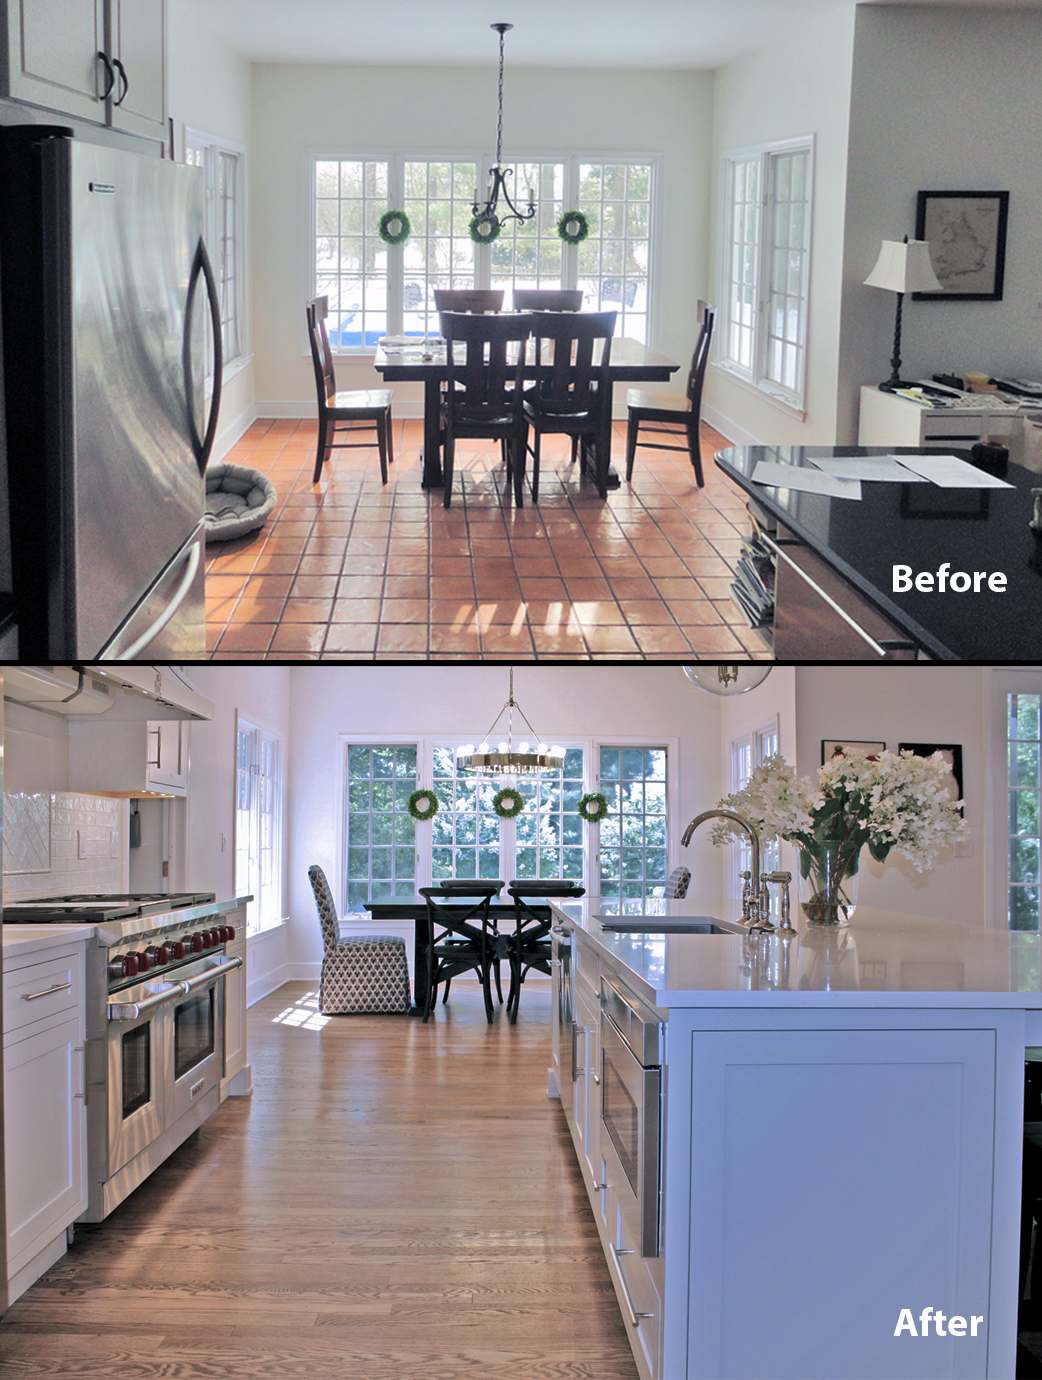 Kitchen before after.jpg